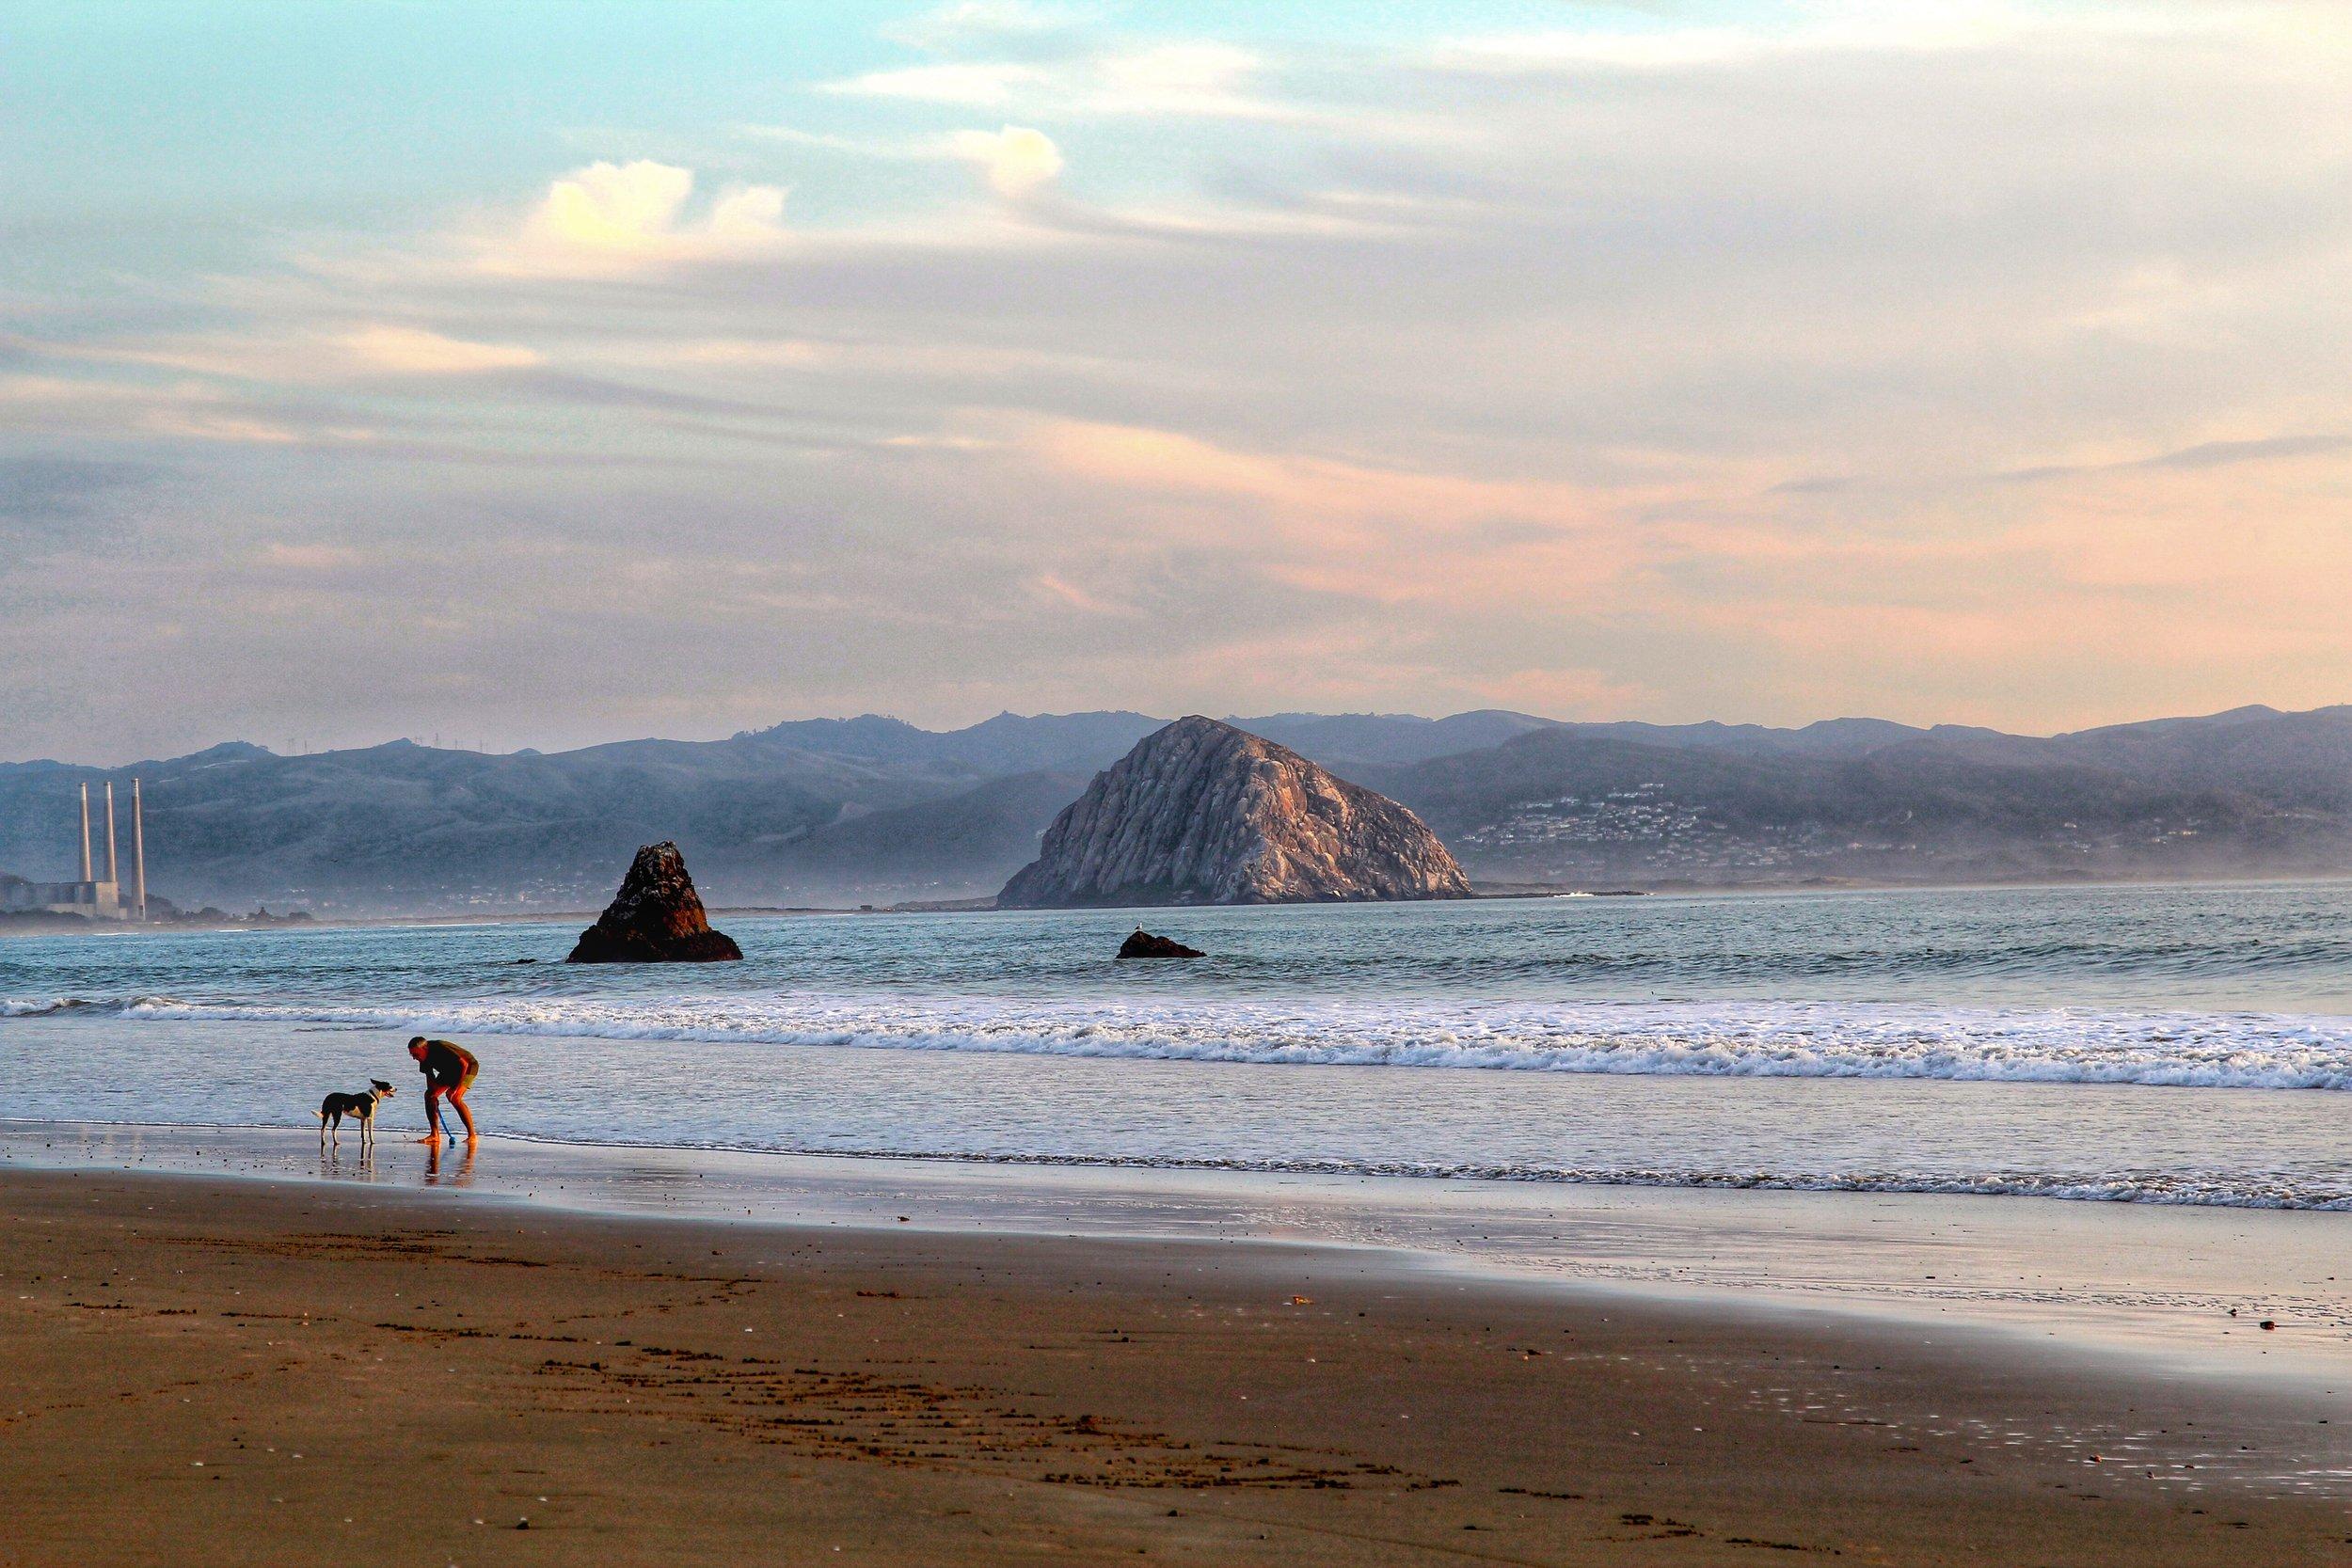 Morro Bay Beach in California